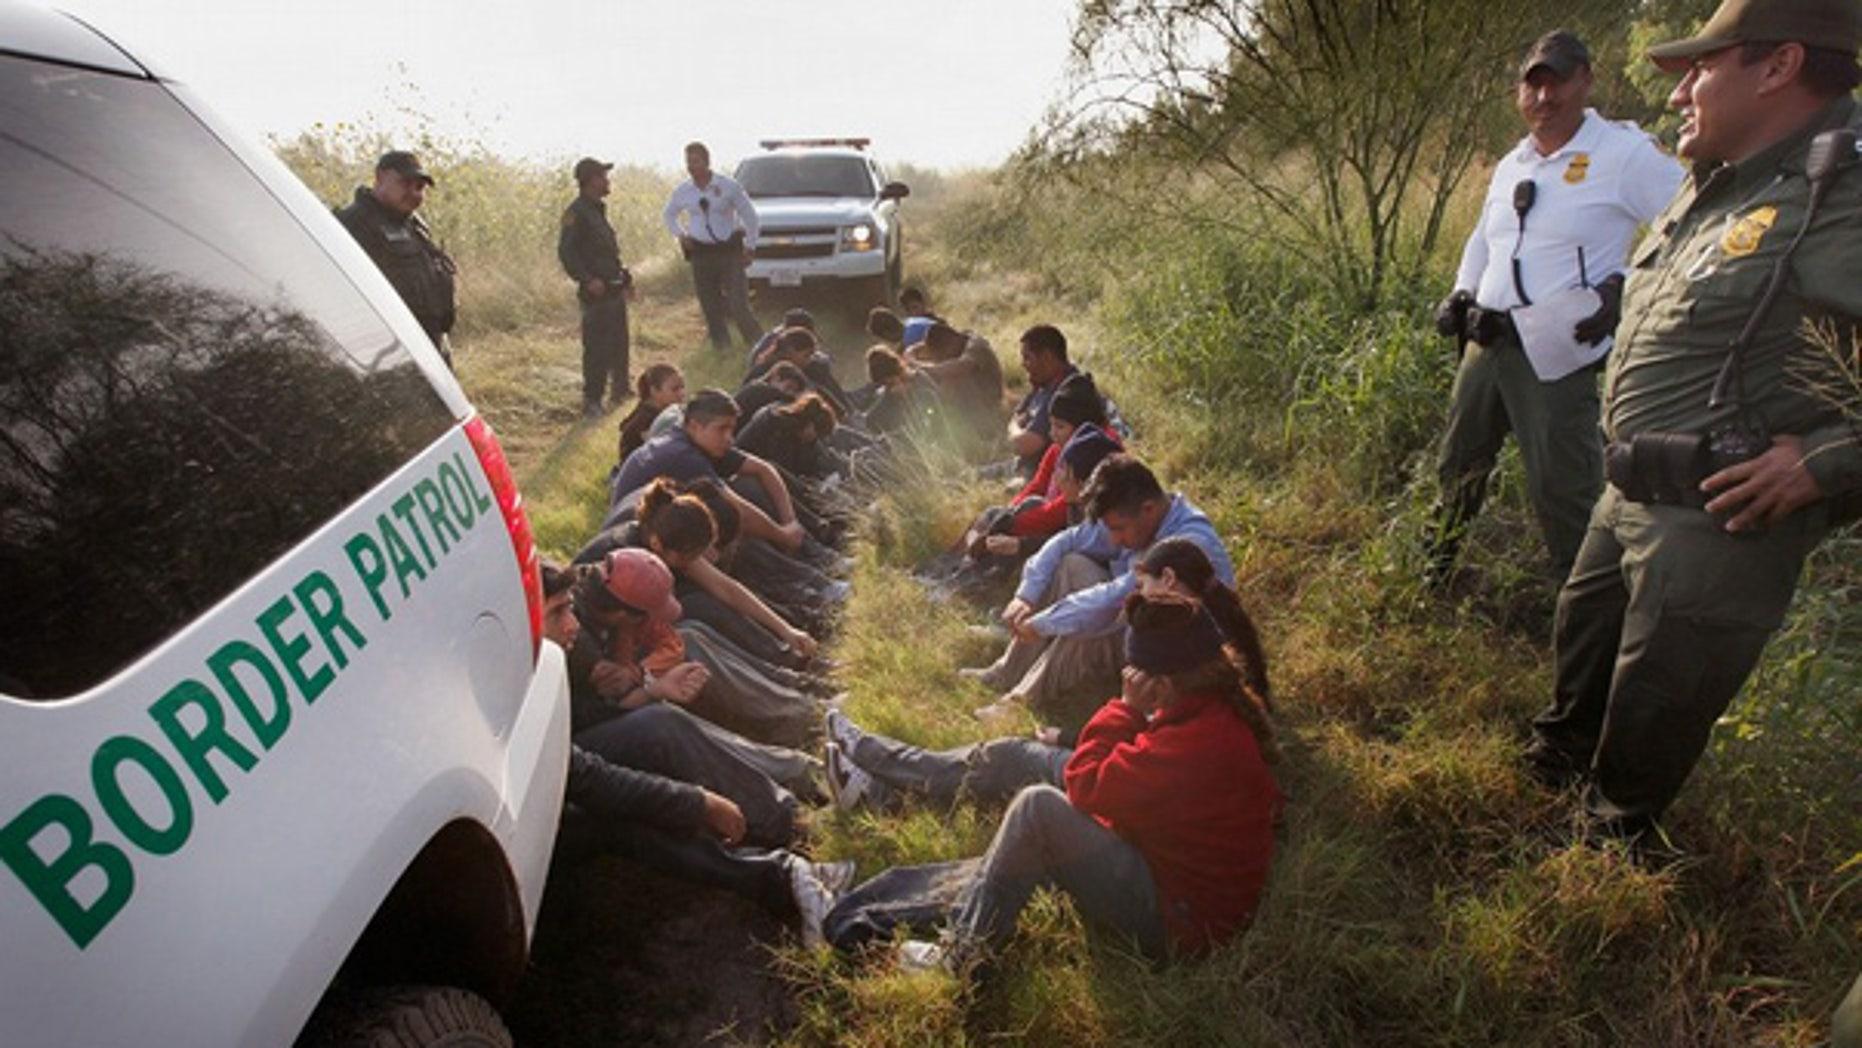 May 28: Border Patrol agents detain undocumented immigrants apprehended near McAllen, Texas.